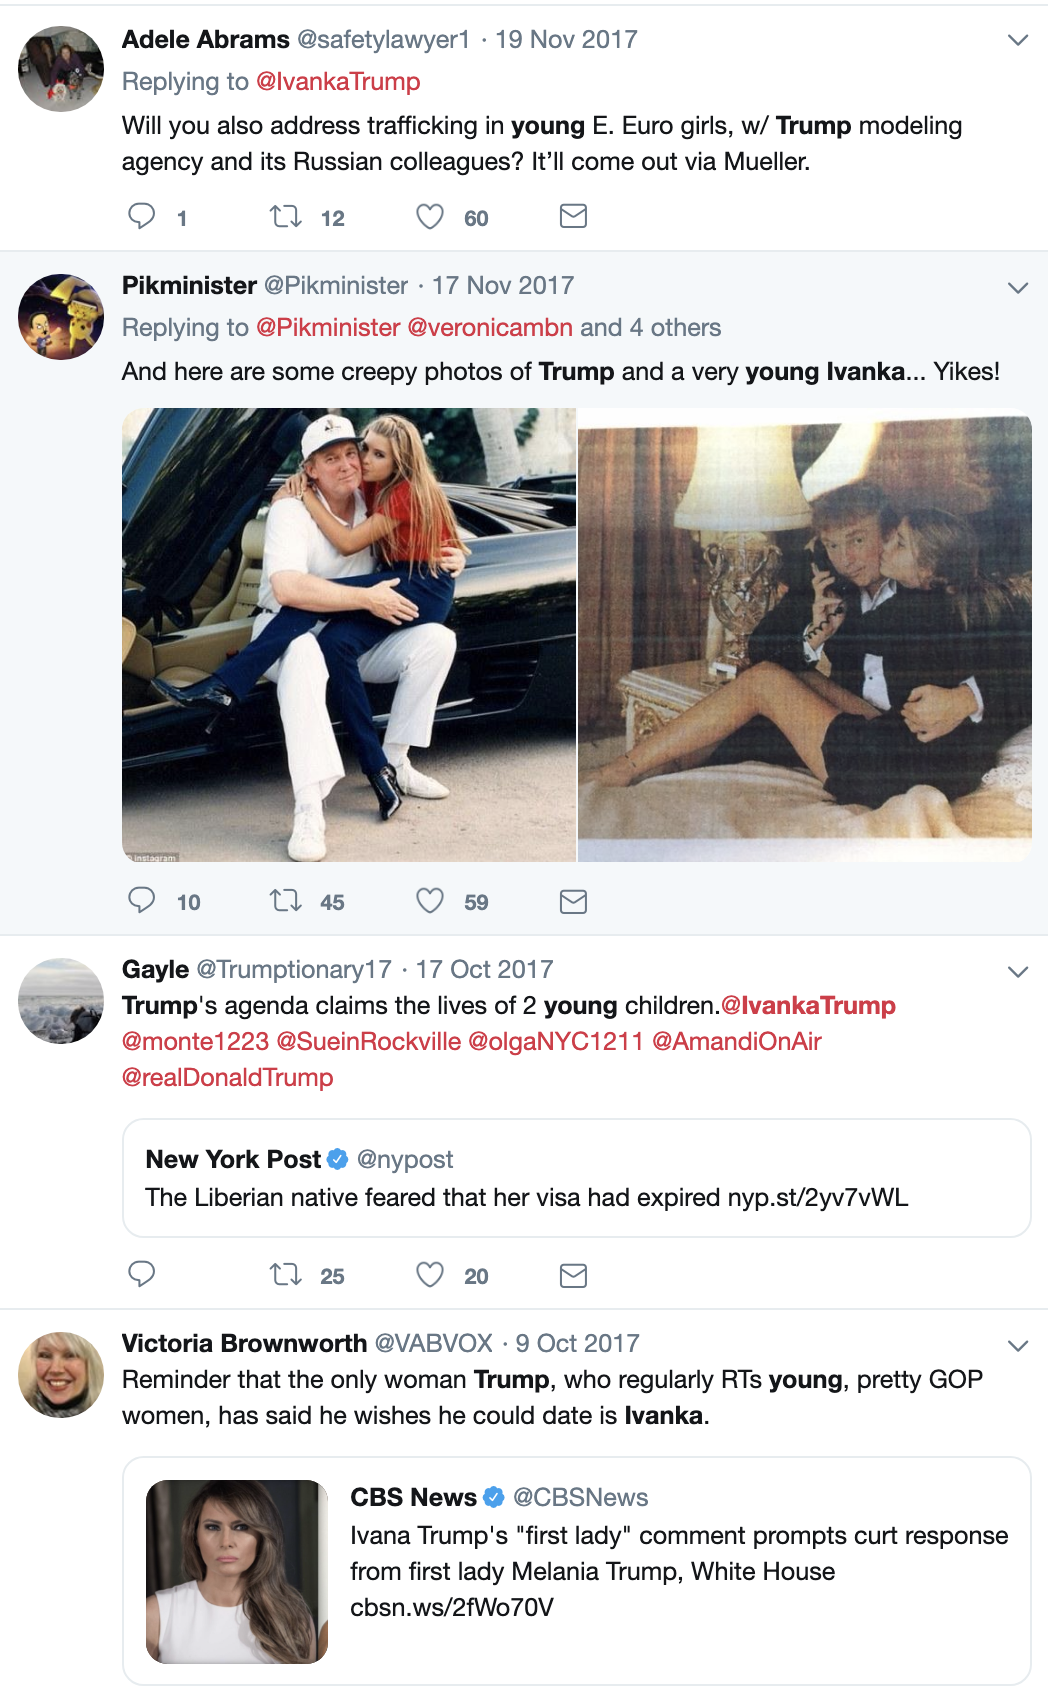 Screen-Shot-2019-05-08-at-4.02.54-PM Trump Hotel Liquor LicenseRevocation Move Humiliates Donald Again Corruption Crime Donald Trump Economy Politics Top Stories